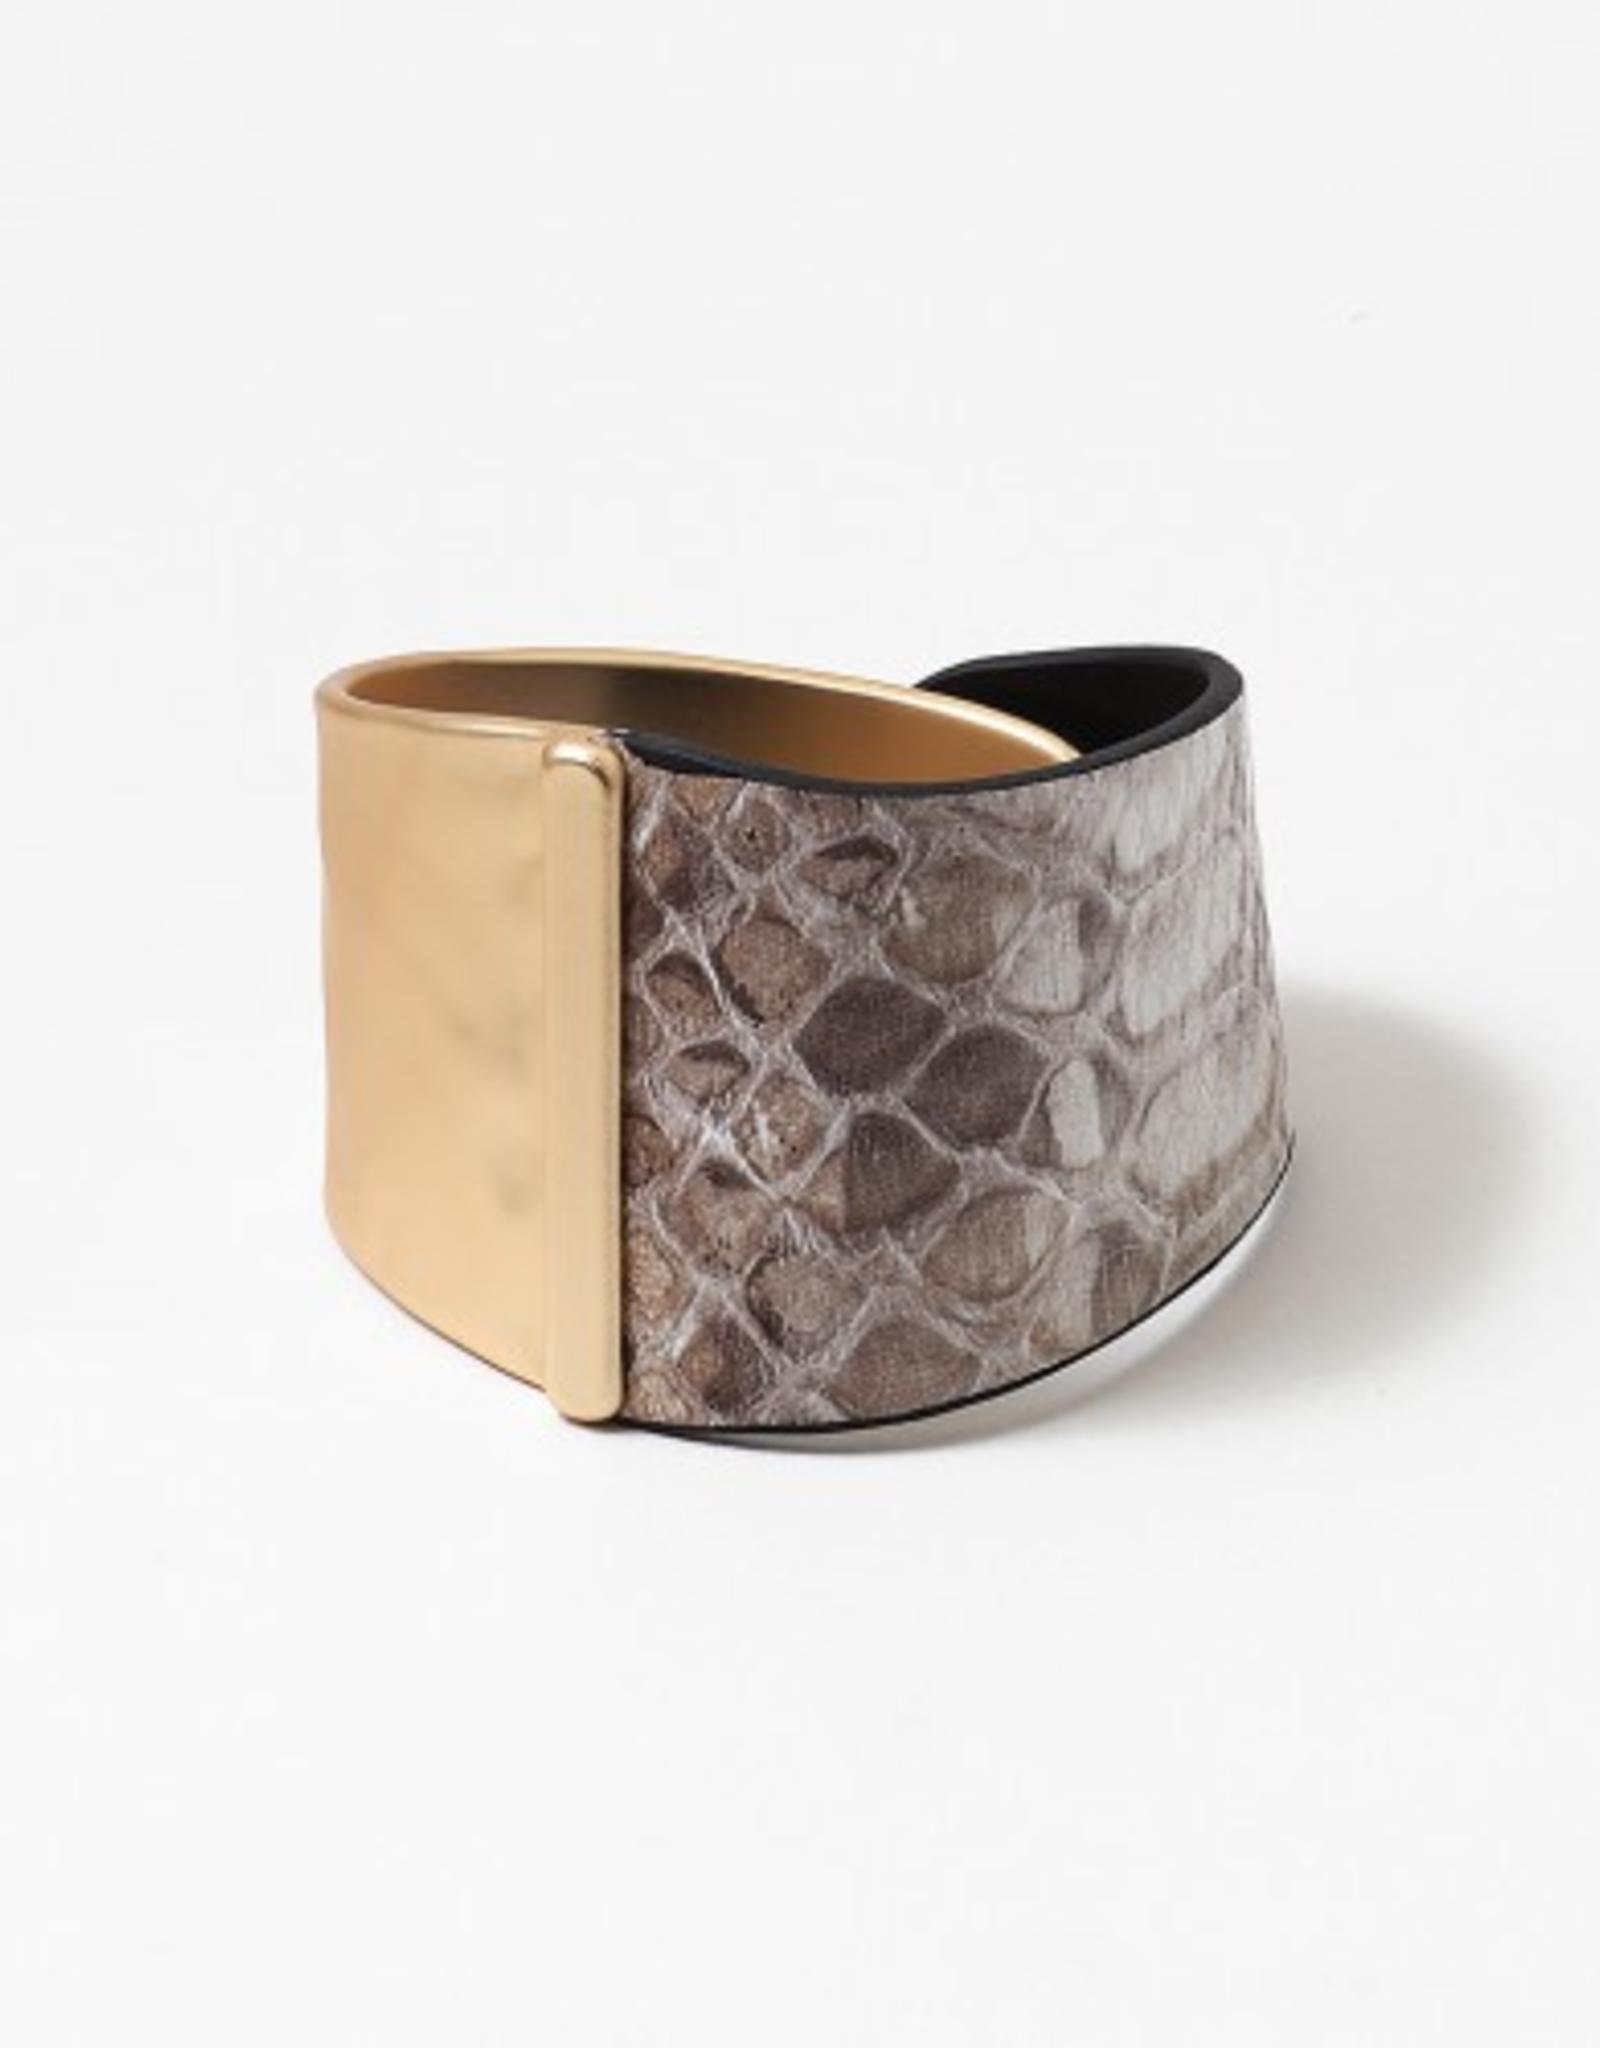 Blue Suede Jewels Leather Snake Skin Print Cuff Bracelet